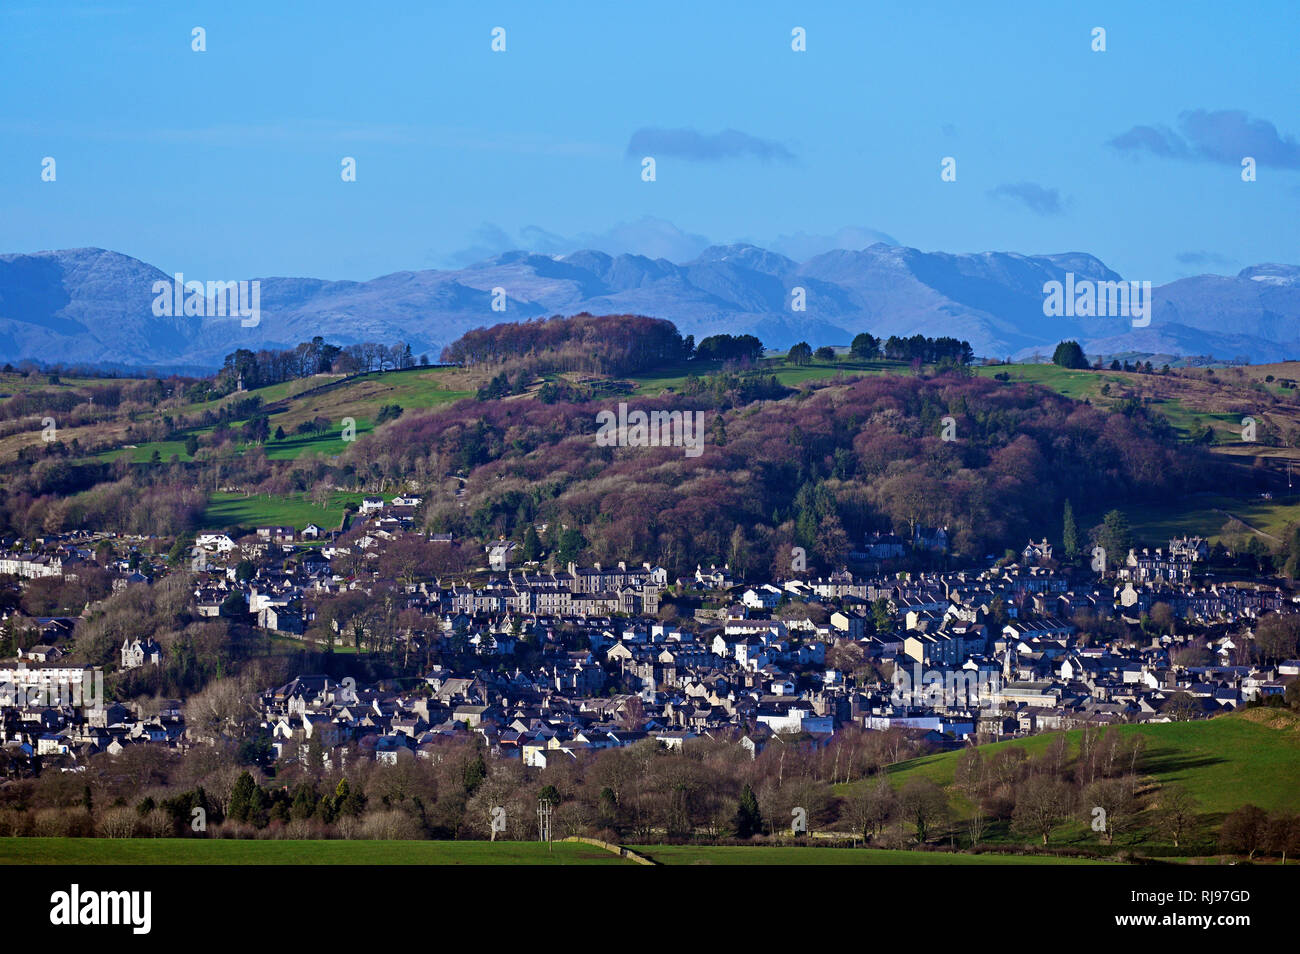 Kendal and the Lake District Fells. Cumbria, England, United Kingdom, Europe. - Stock Image